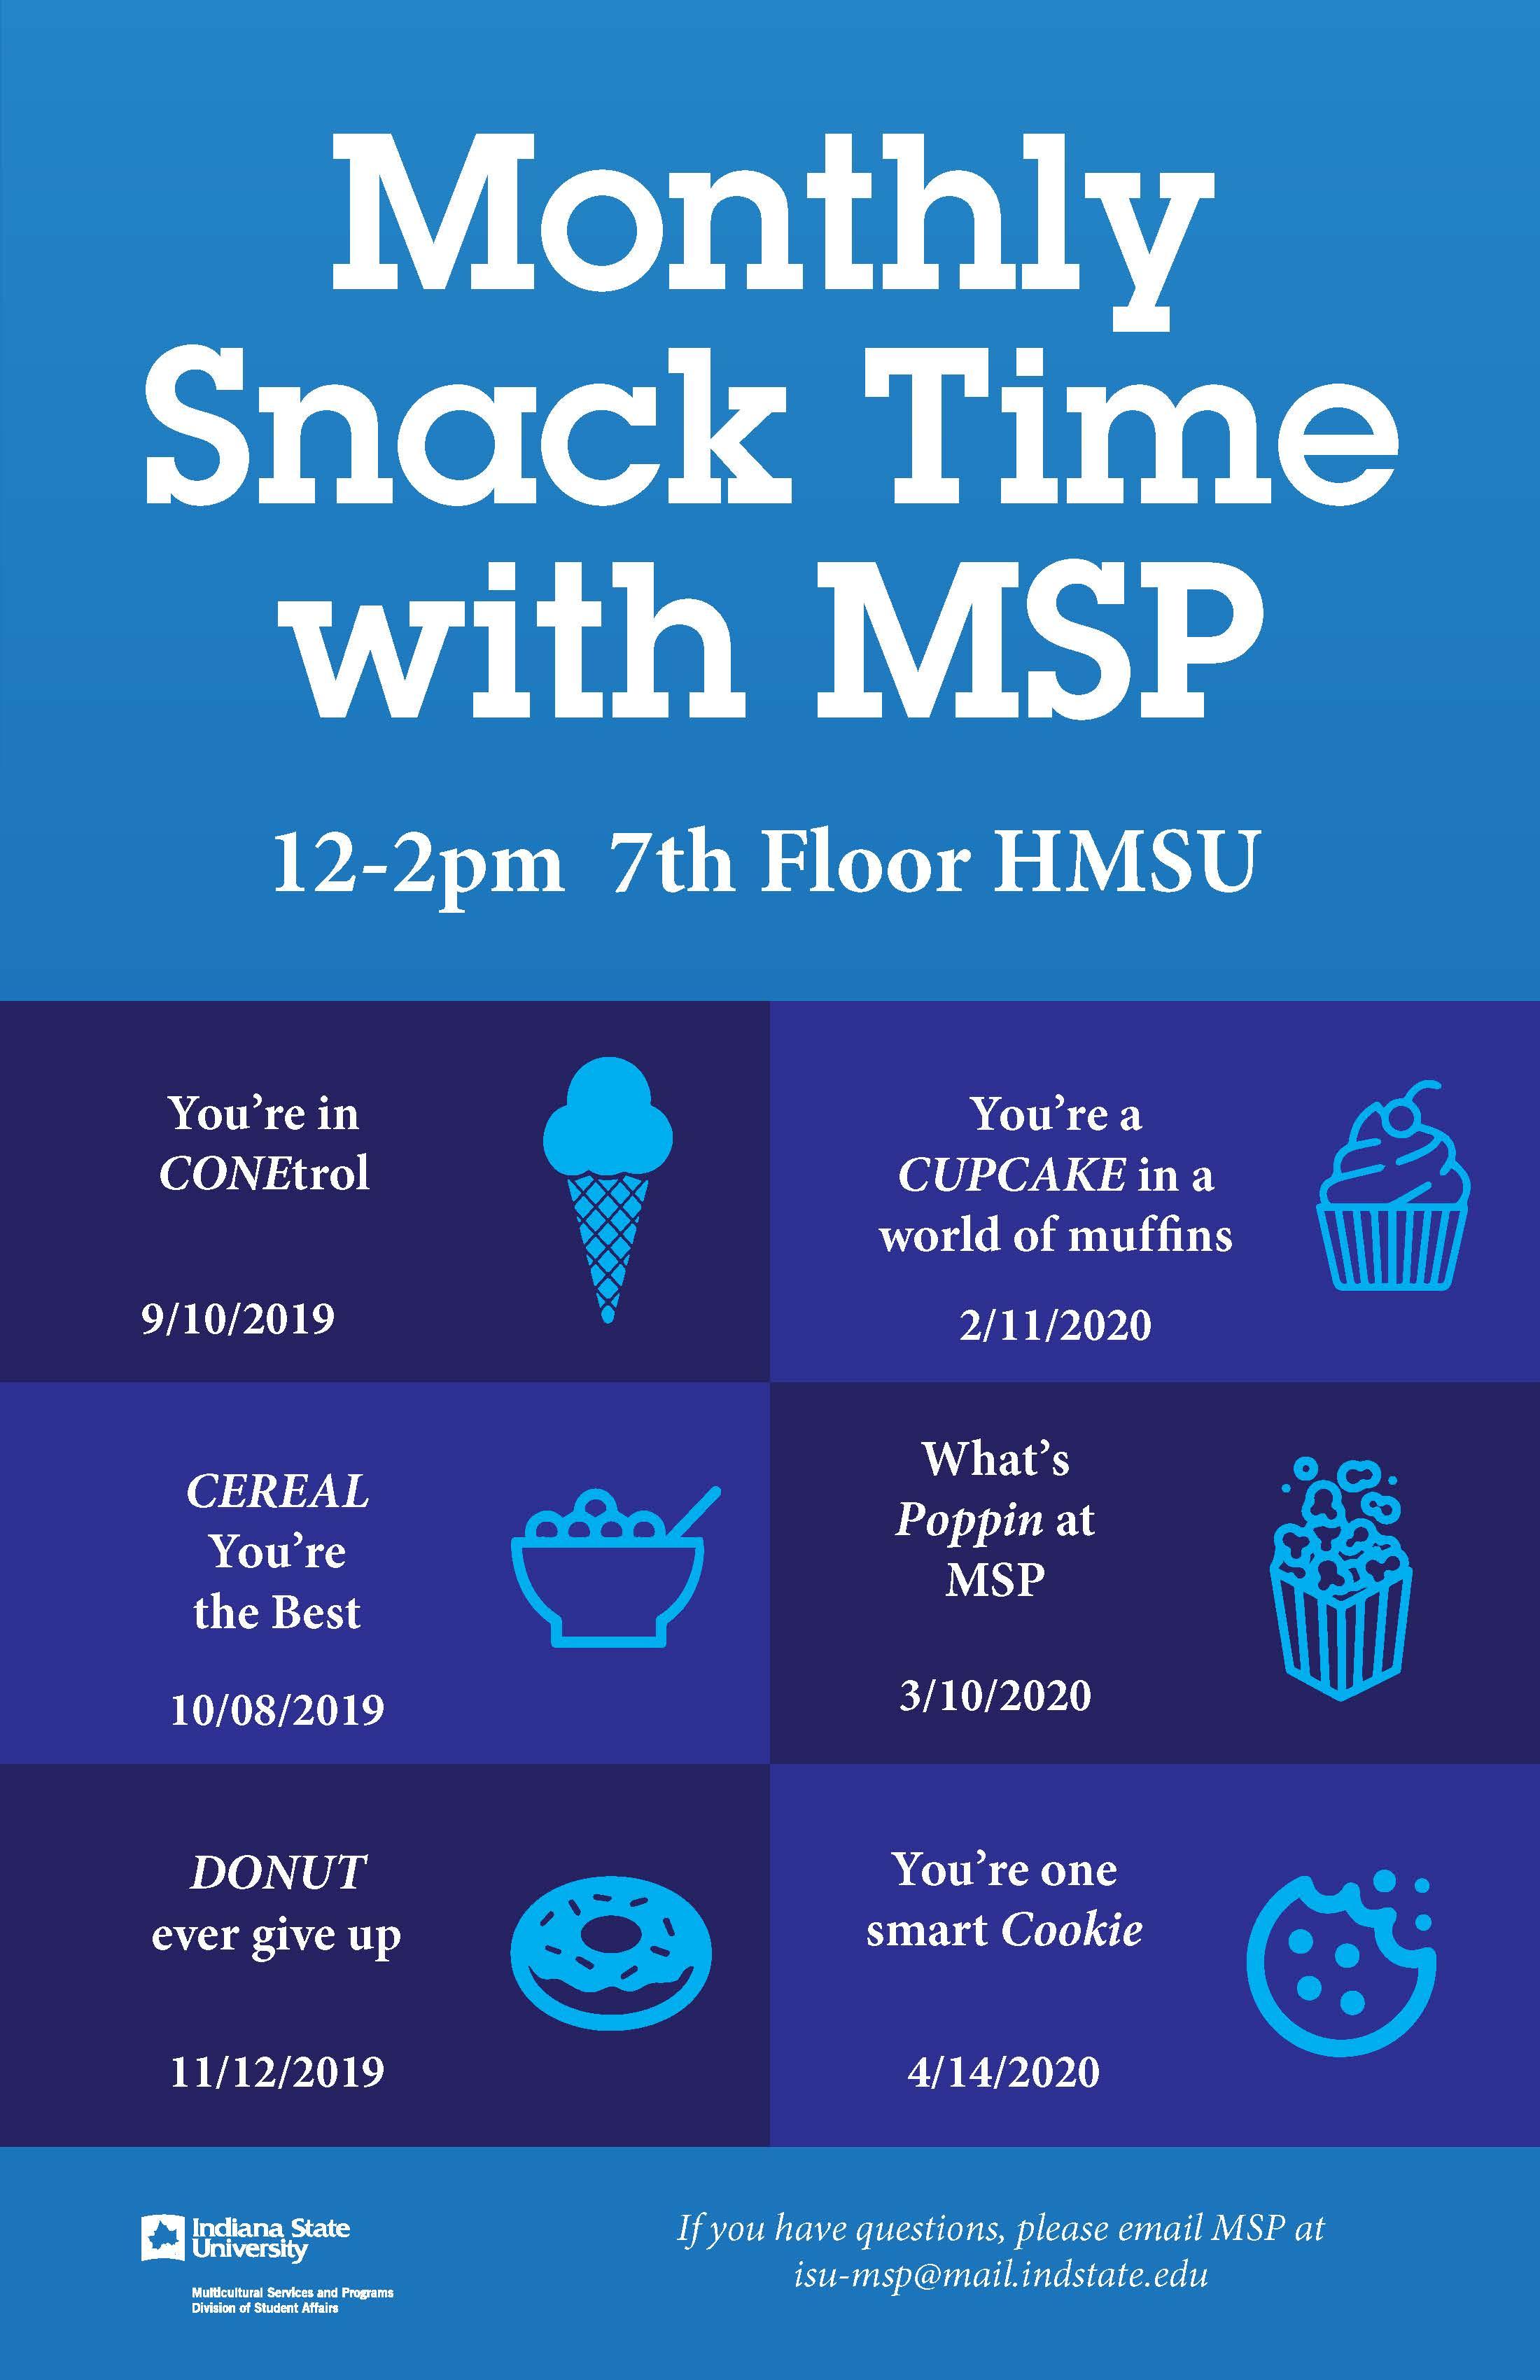 msp-snack-time-11x17.jpg